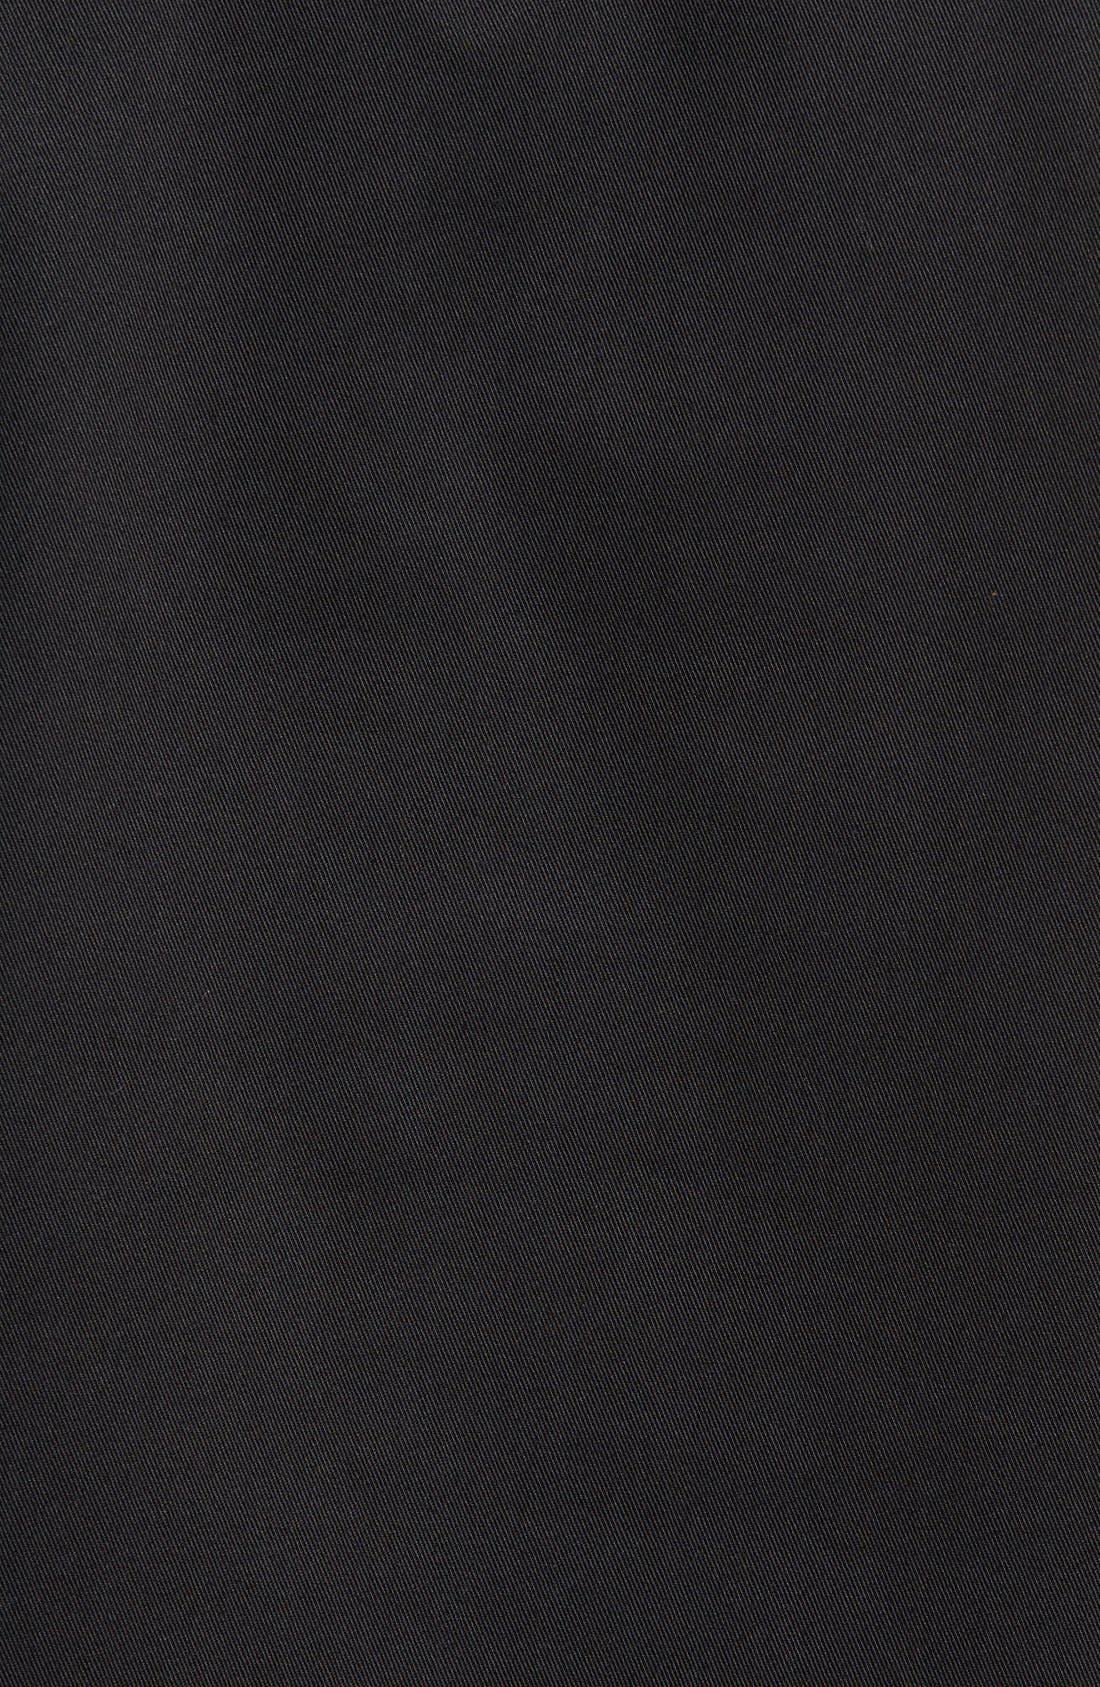 'Clinton' Hooded Anorak,                             Alternate thumbnail 5, color,                             Black